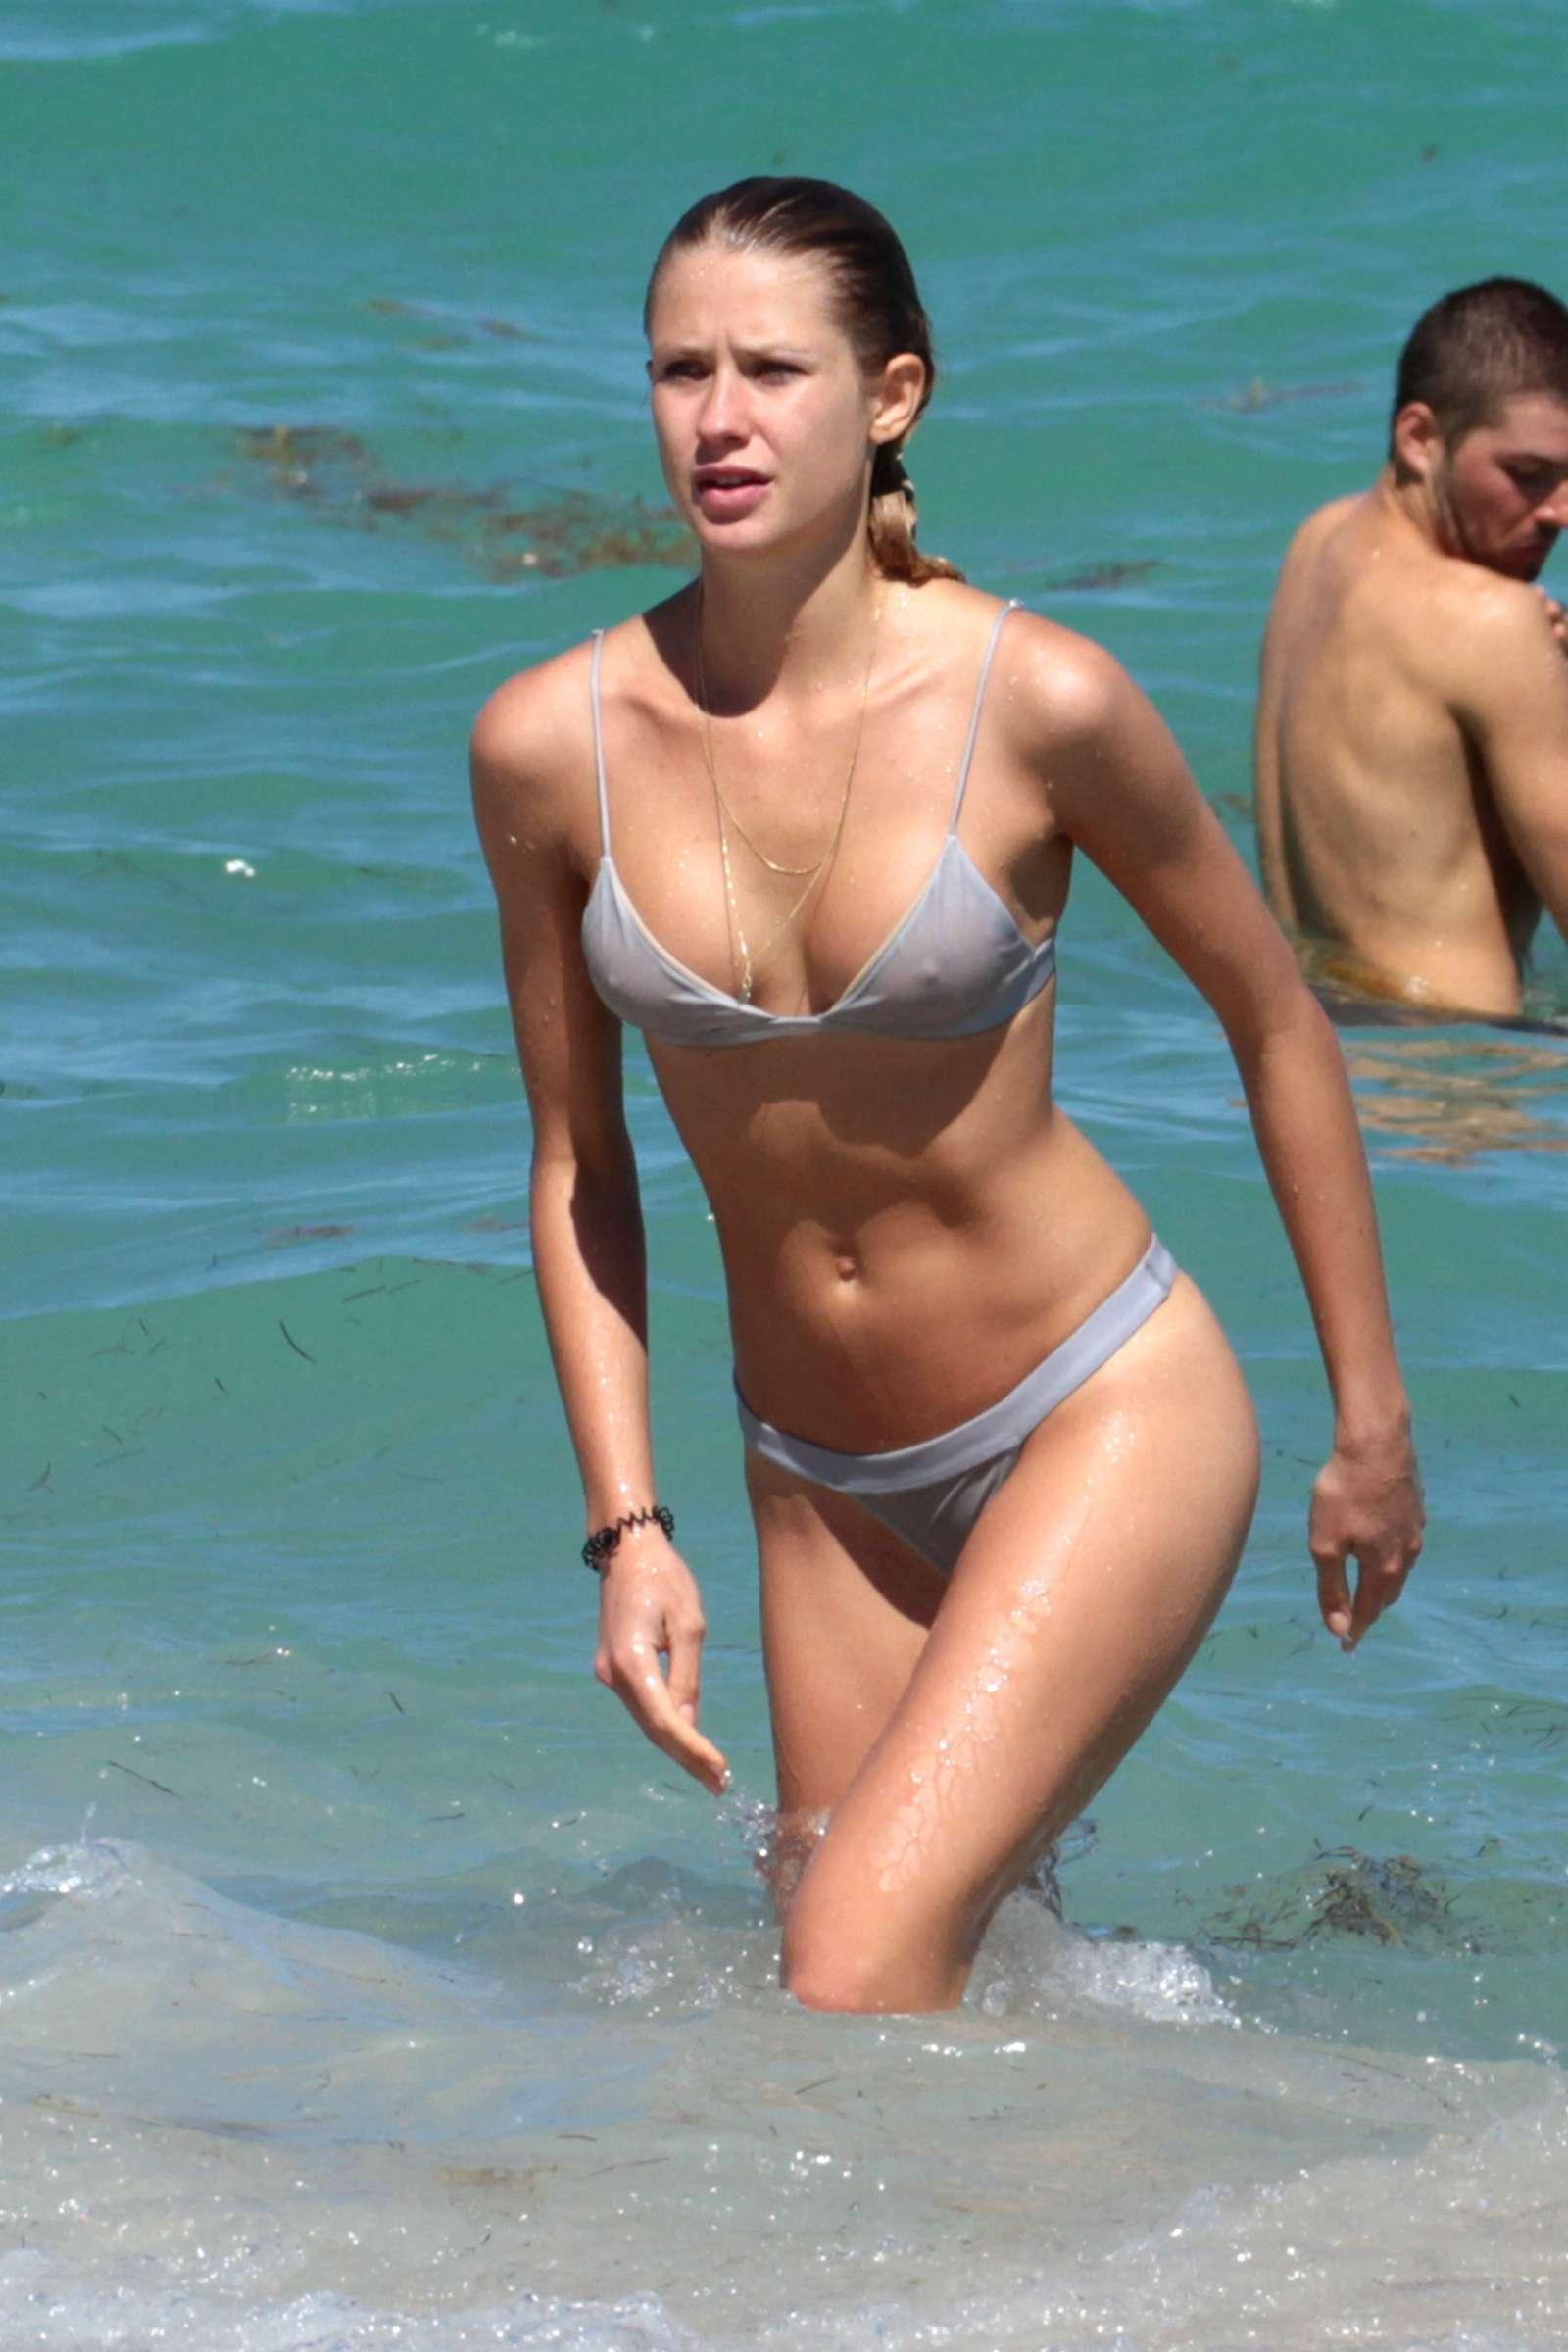 Anouk van Kleef in Bikini at the beach in Miami